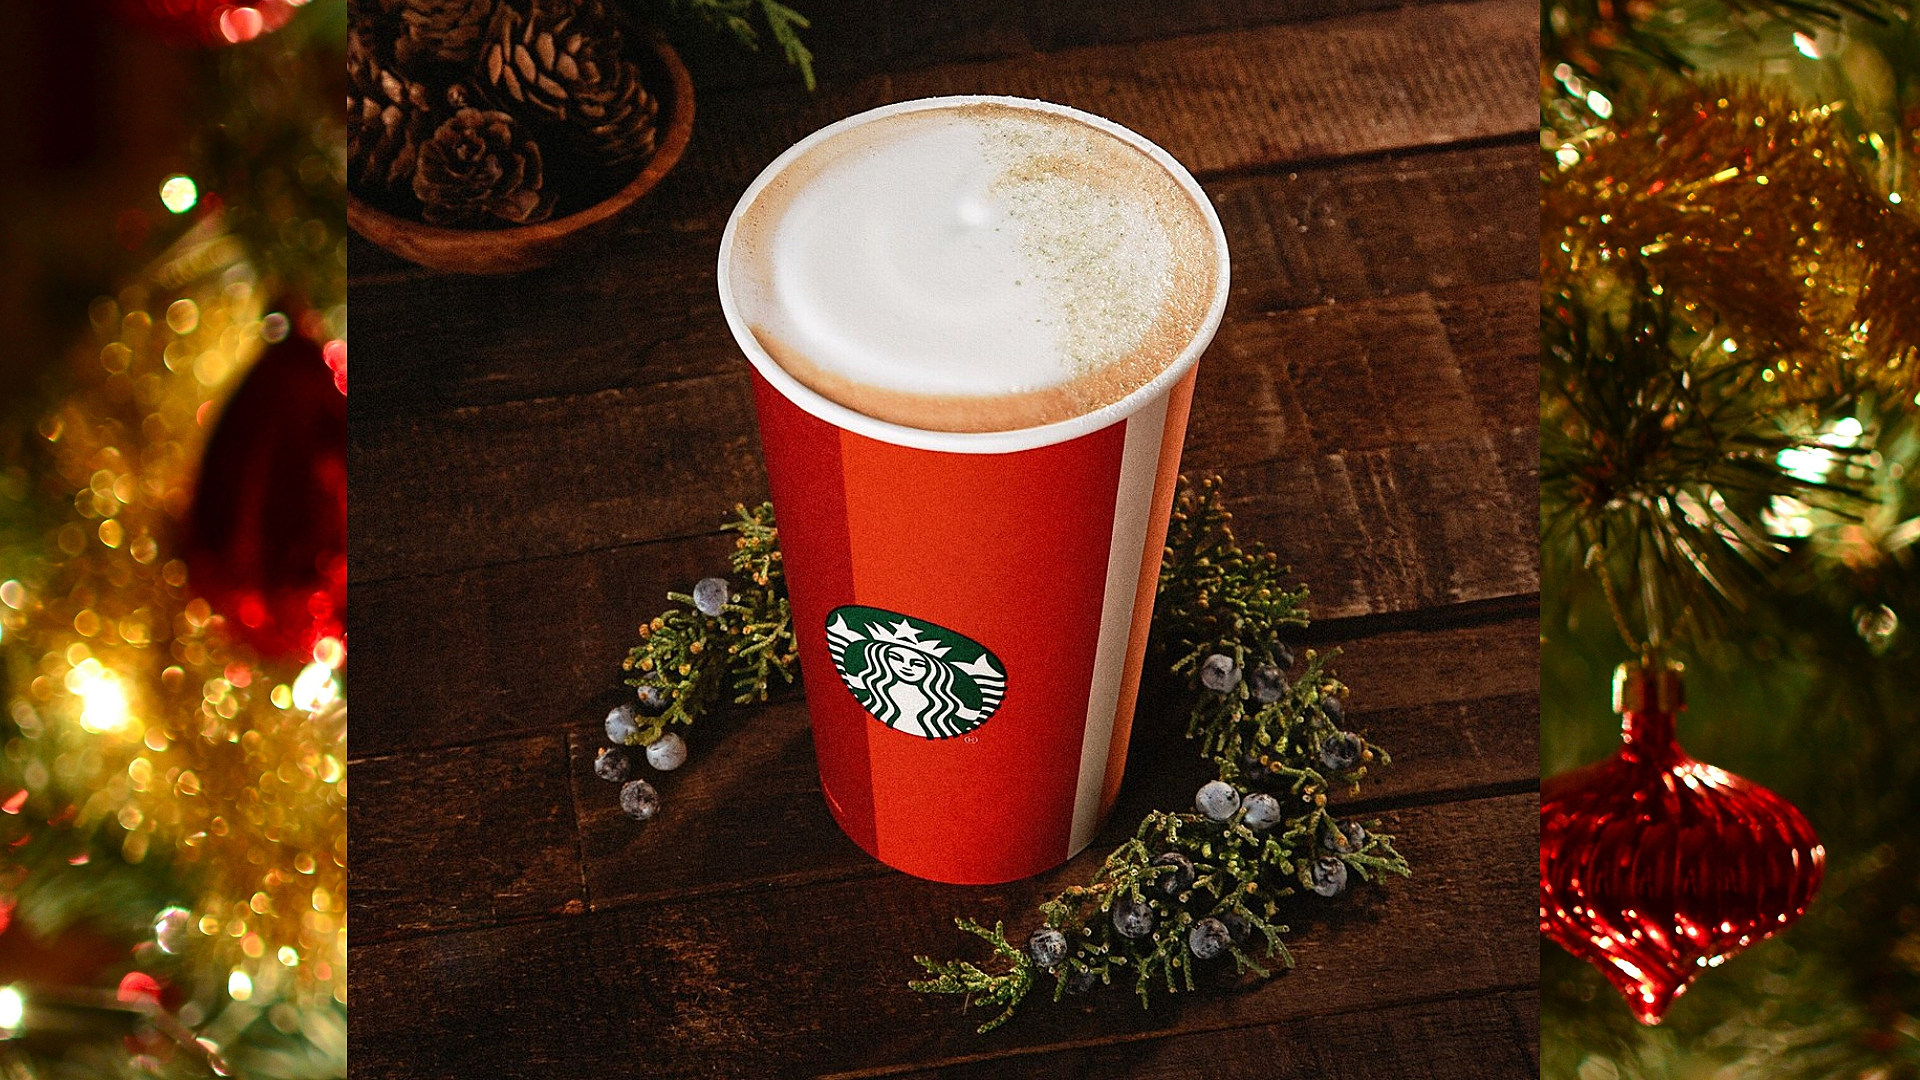 Starbucks Christmas.Starbucks New Holiday Drink Tastes Like A Christmas Tree Video